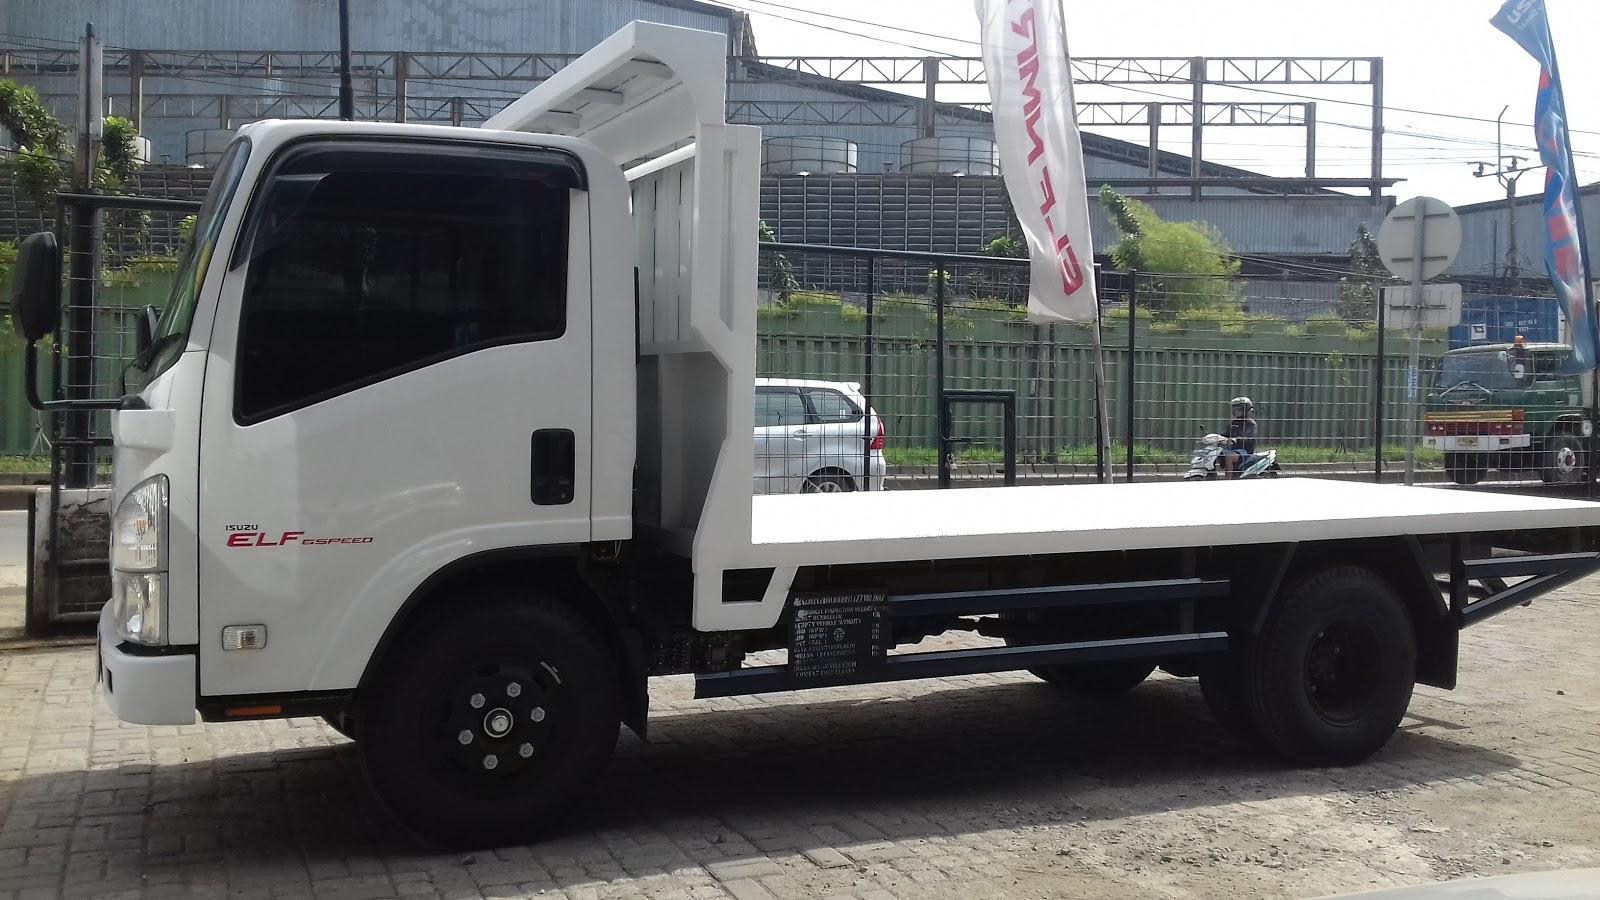 Variasi Mobil Truk Isuzu Terbaru Sobat Modifikasi